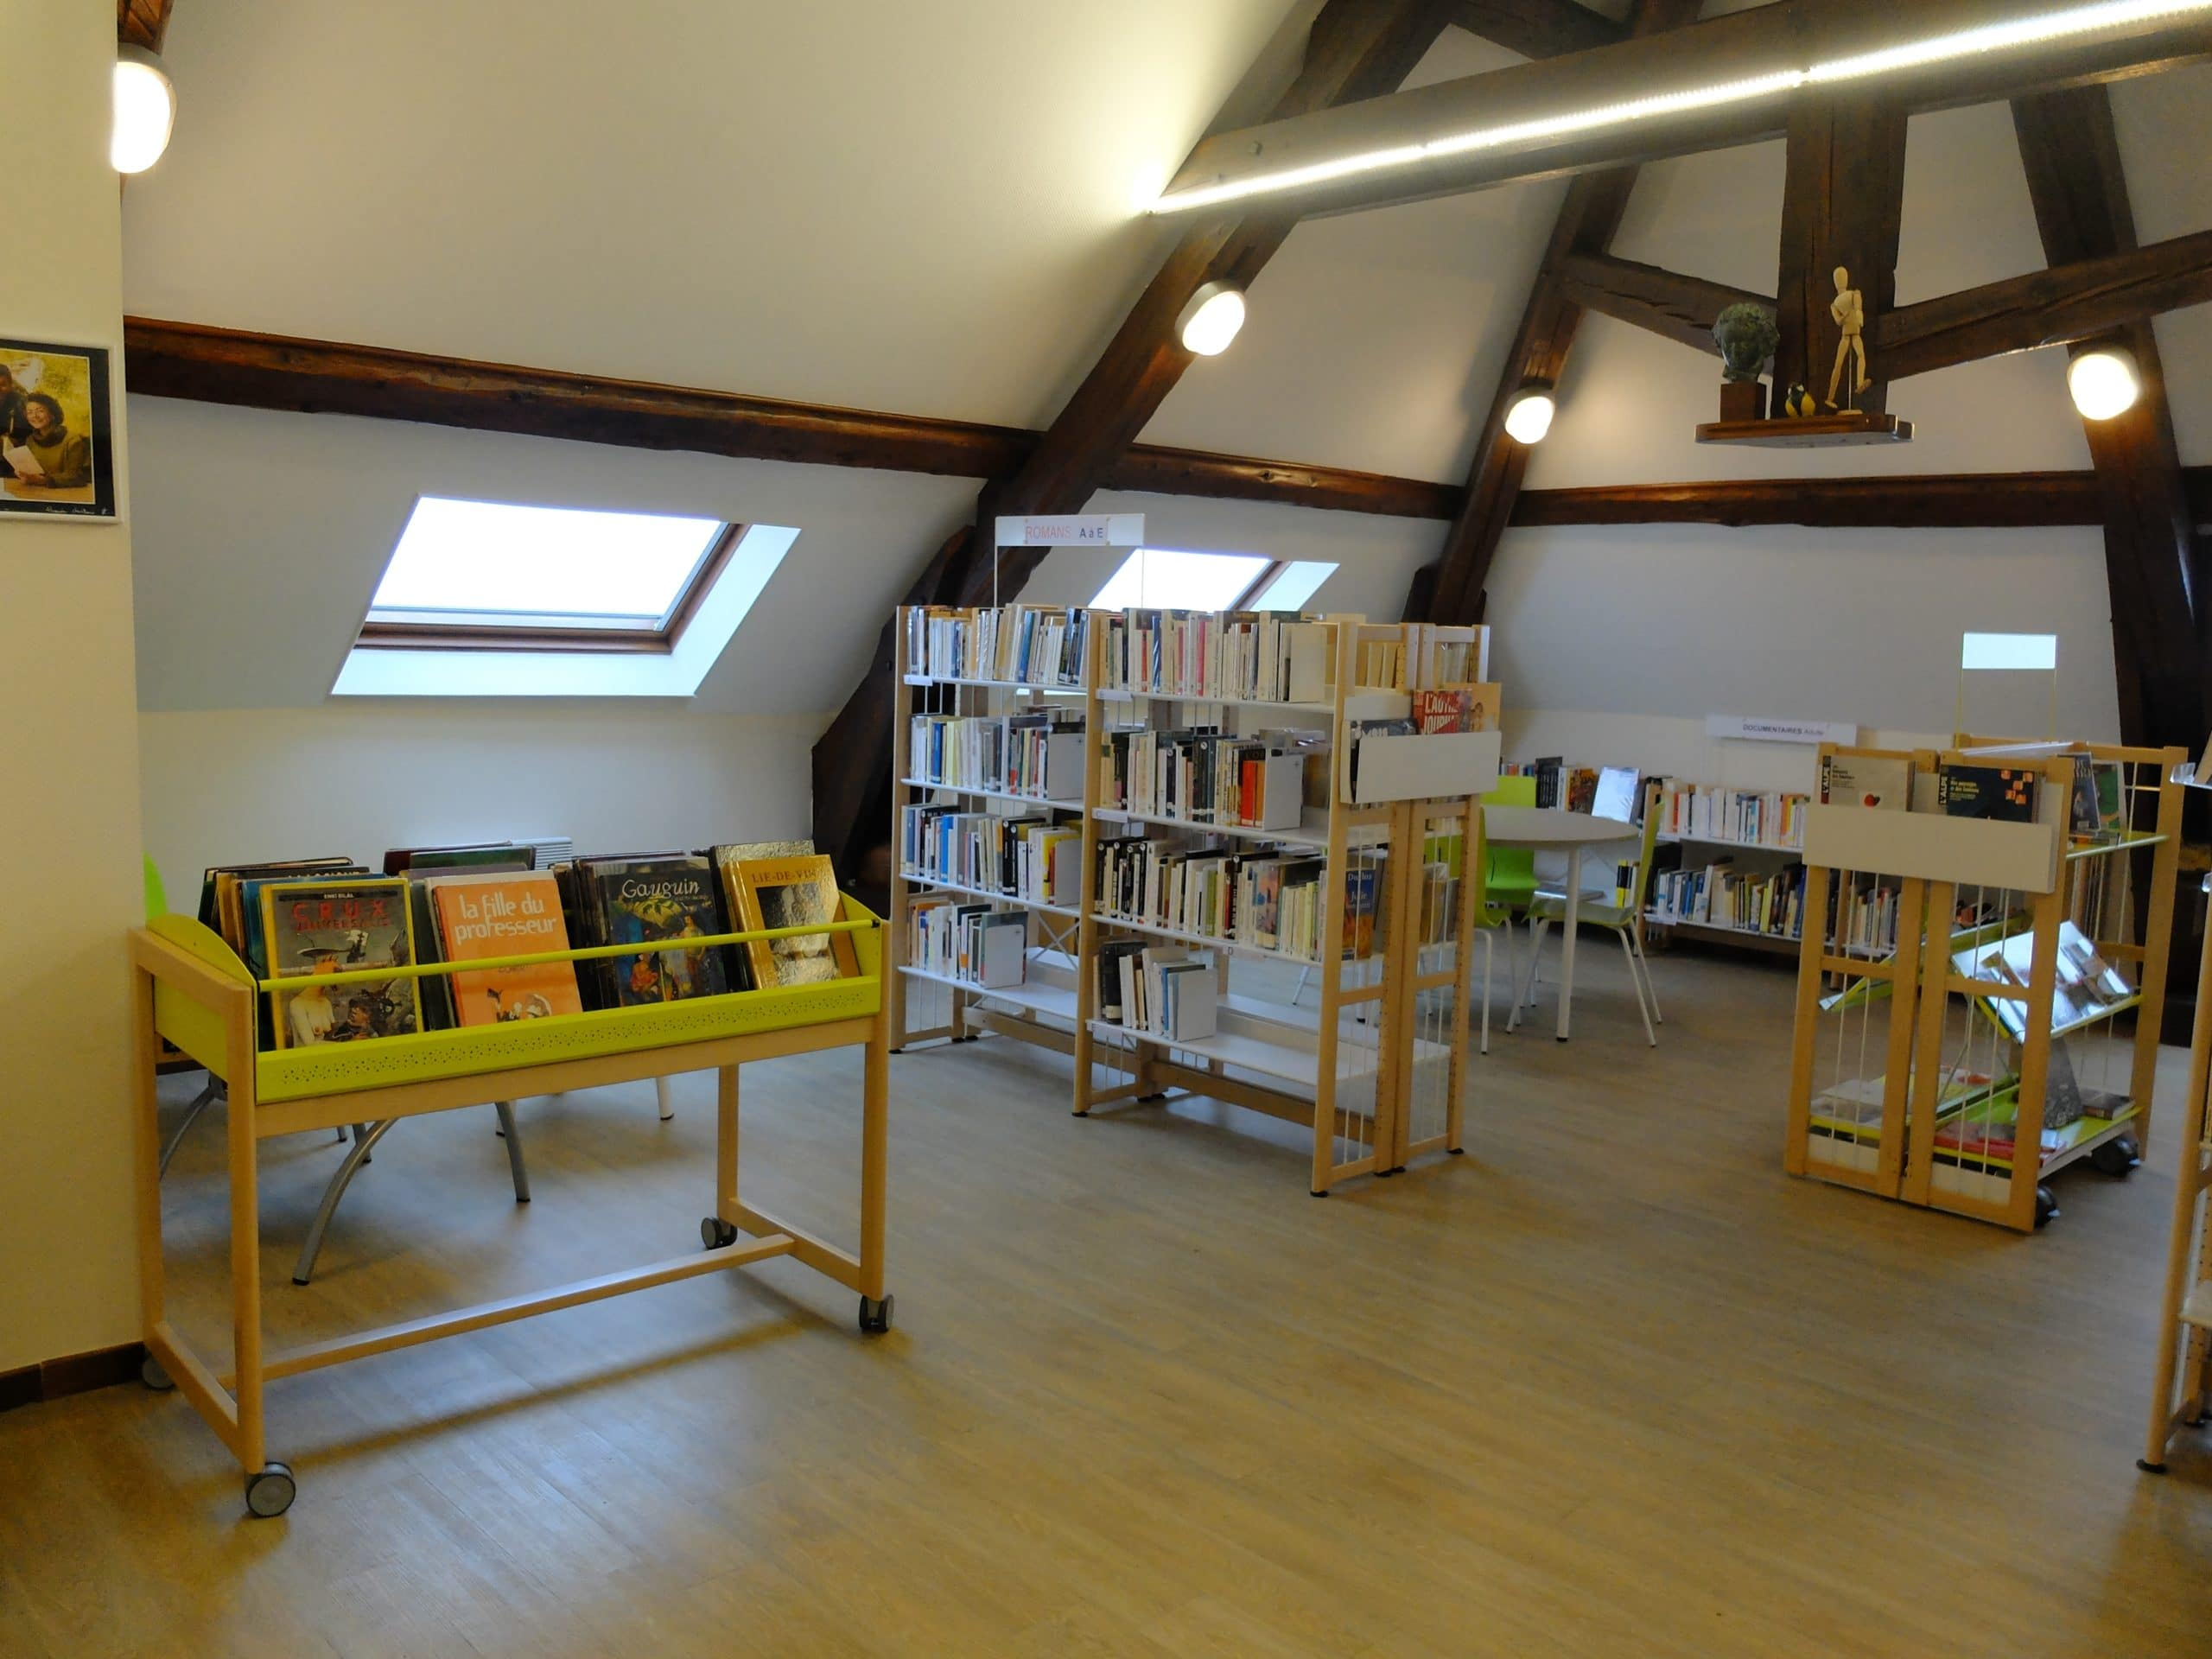 Visuel bibliothèque 2 scaled - Bibliothèque